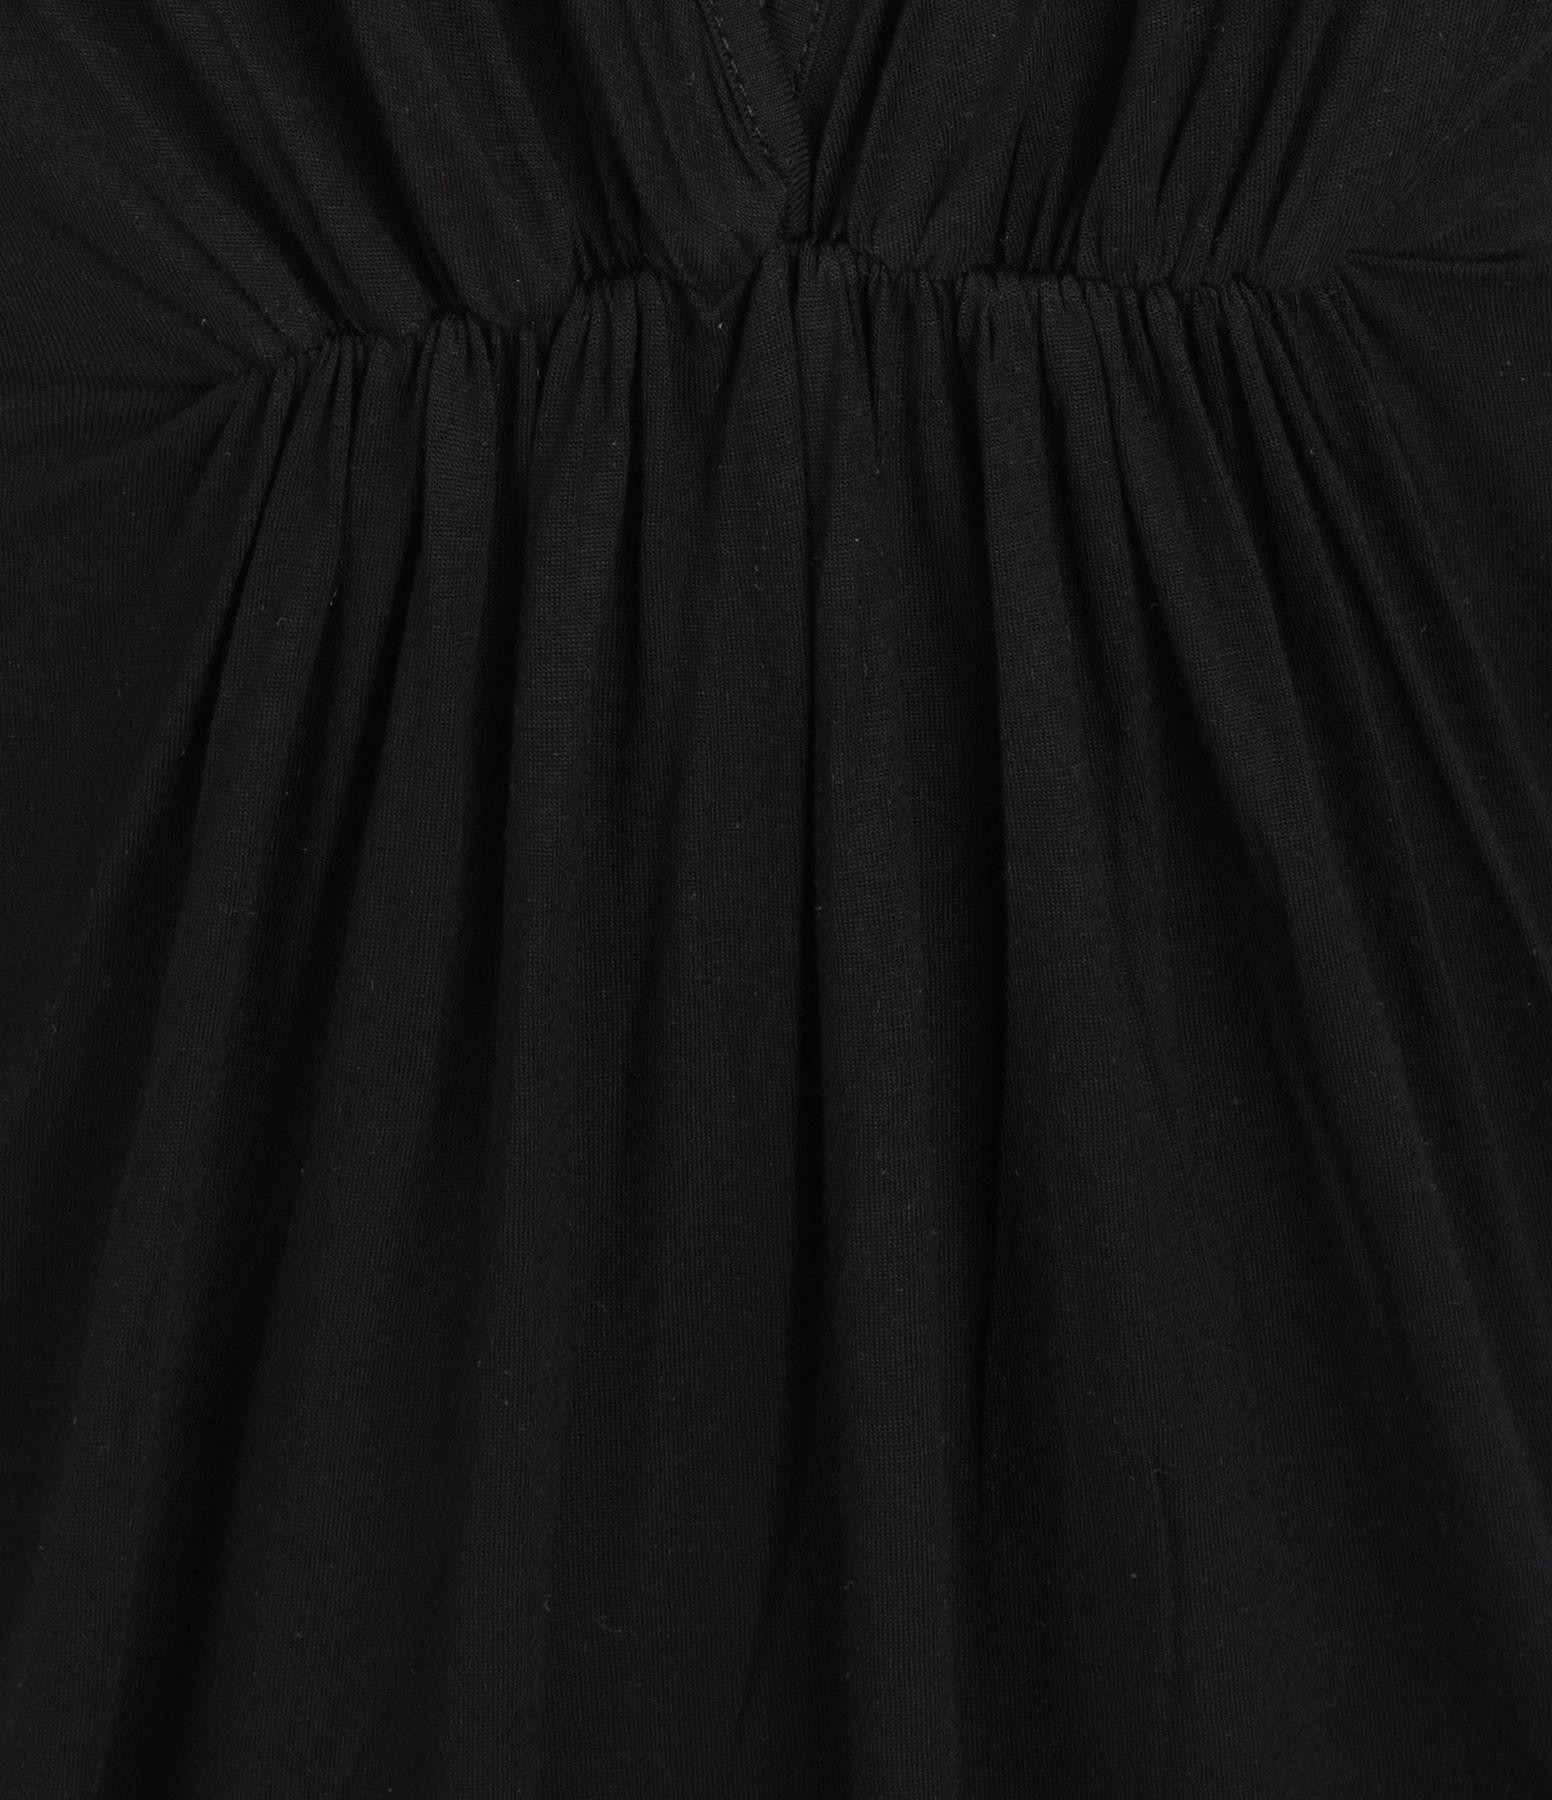 MAEVY - Robe Lilou Bambou Noir